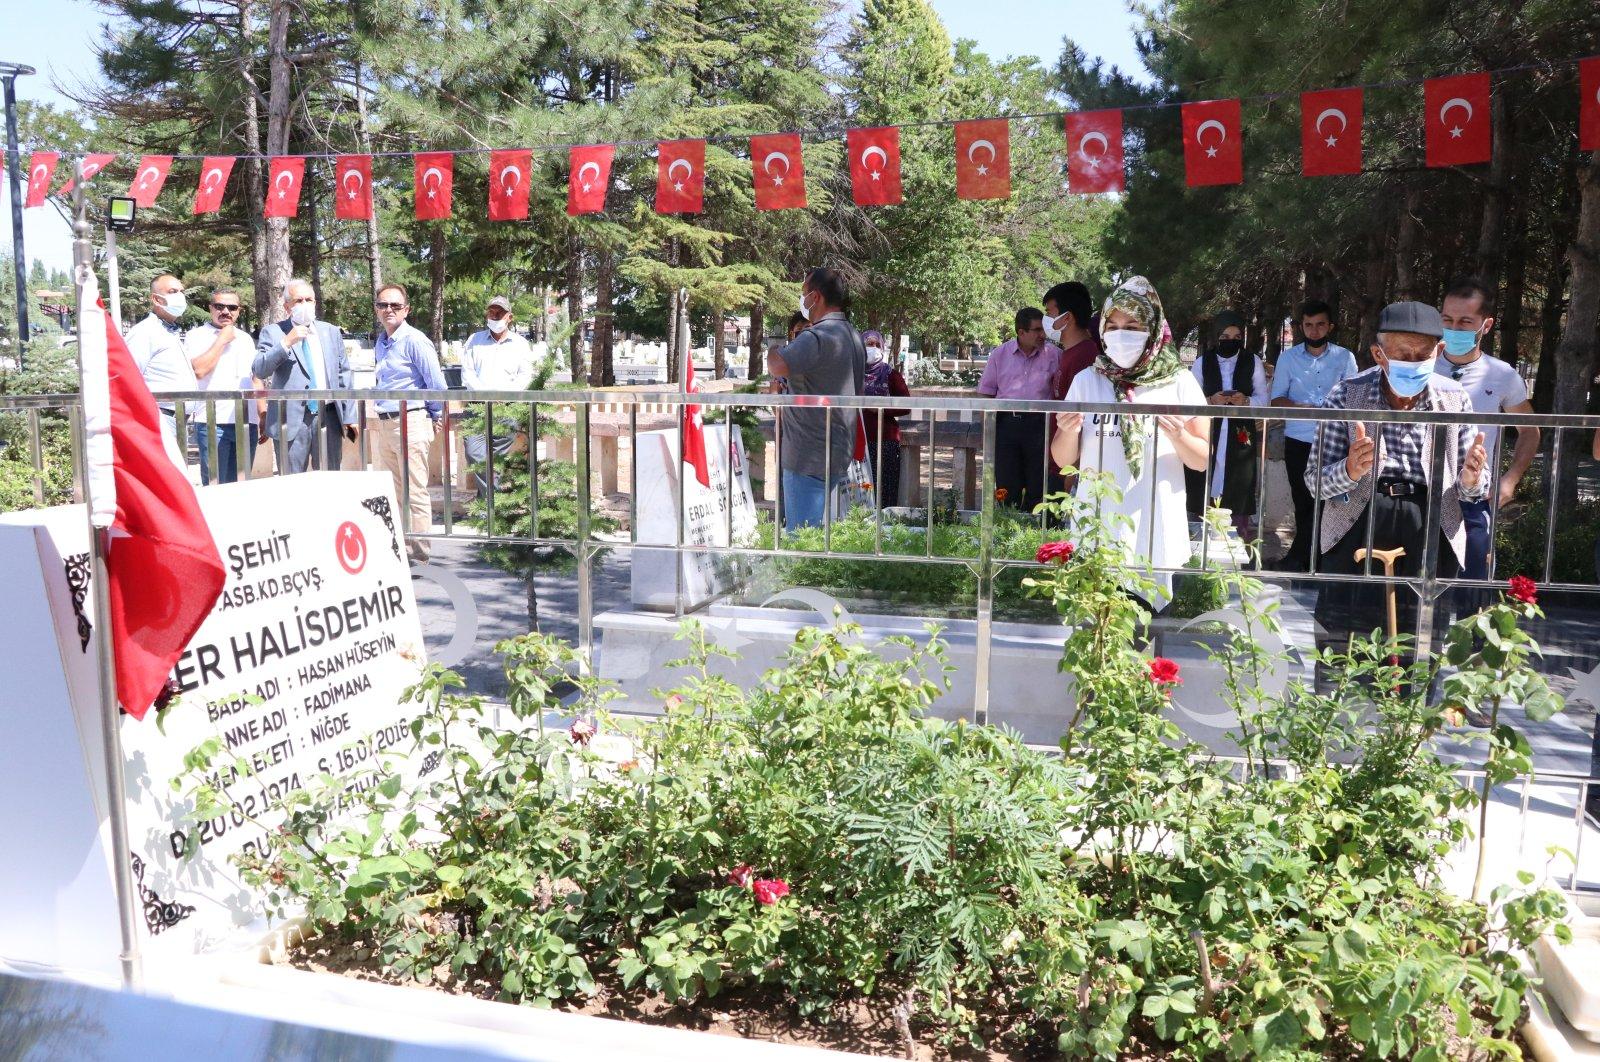 People pray by the graveside of Ömer Halisdemir, in Niğde, central Turkey, July 15, 2021. (AA PHOTO)